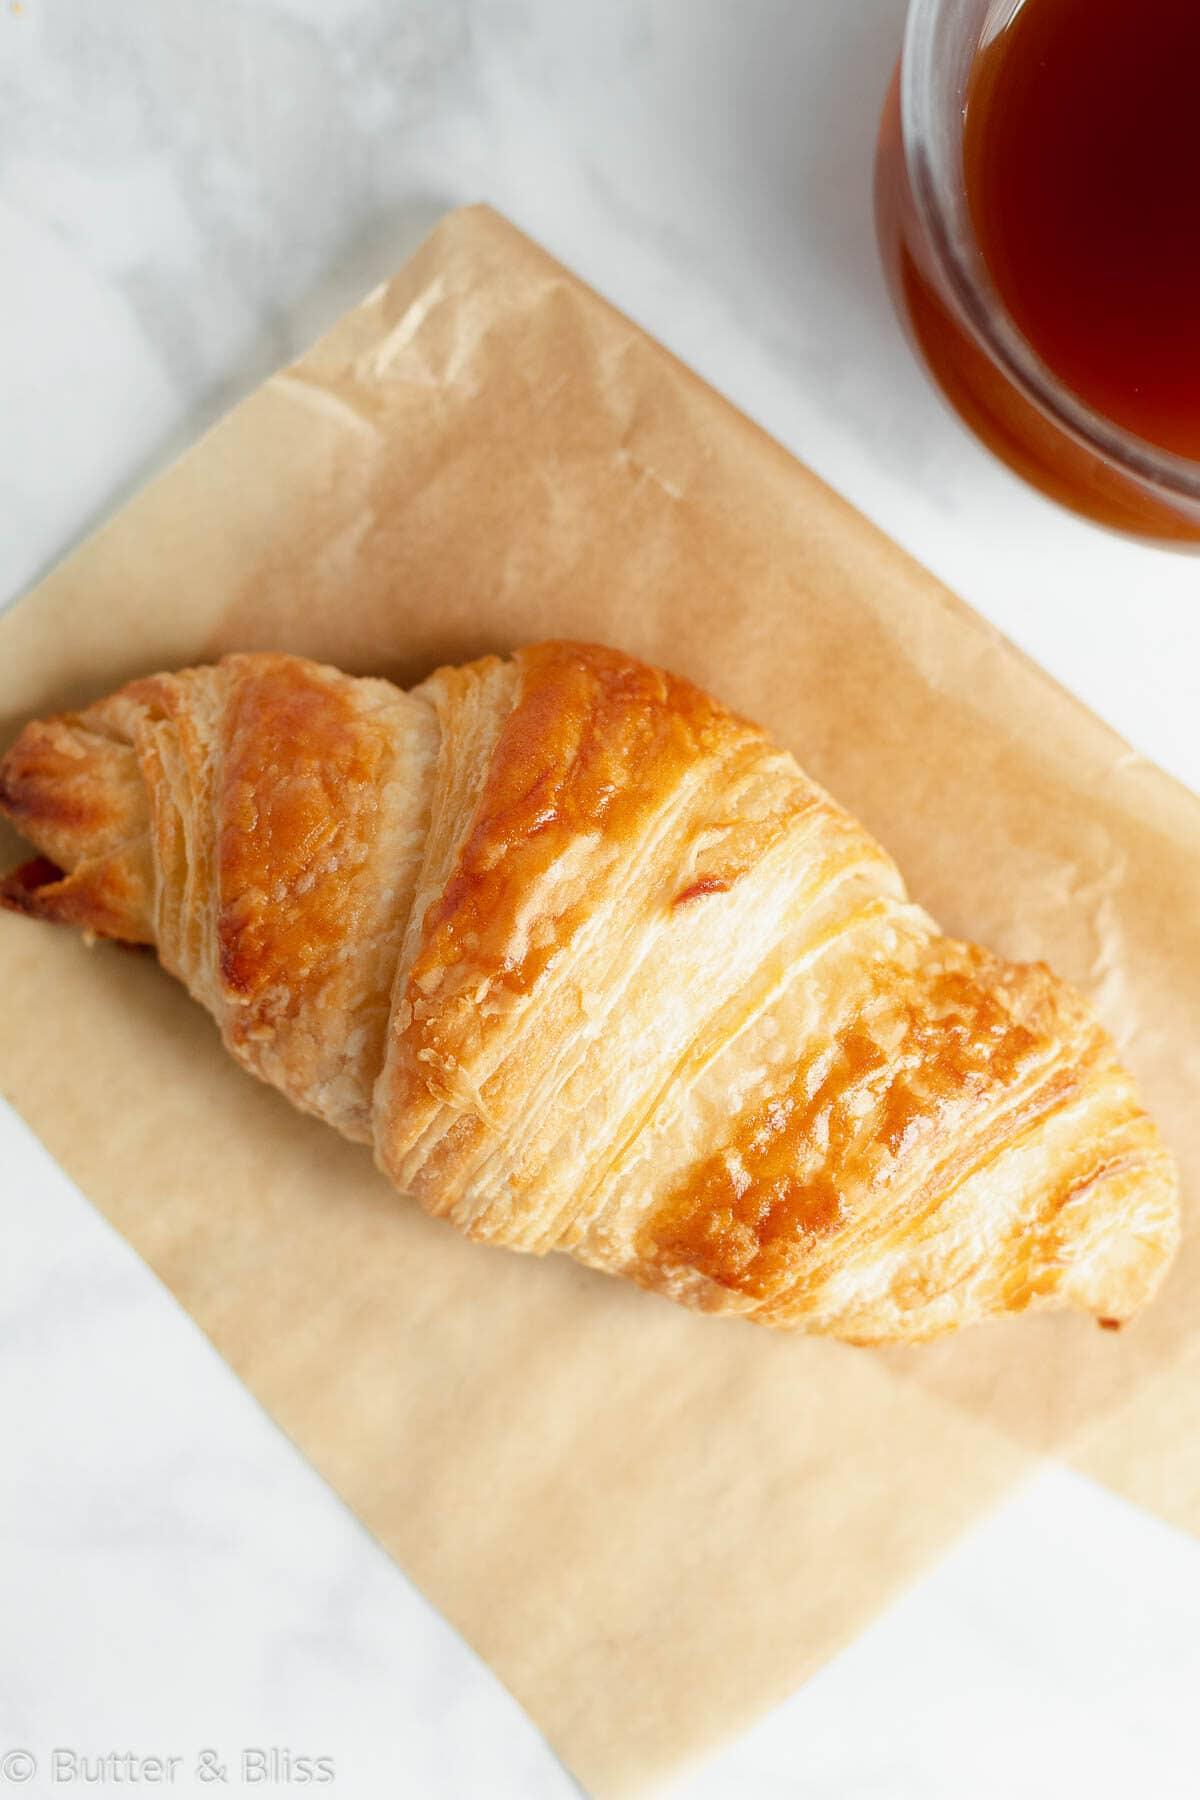 Single croissant on a napkin